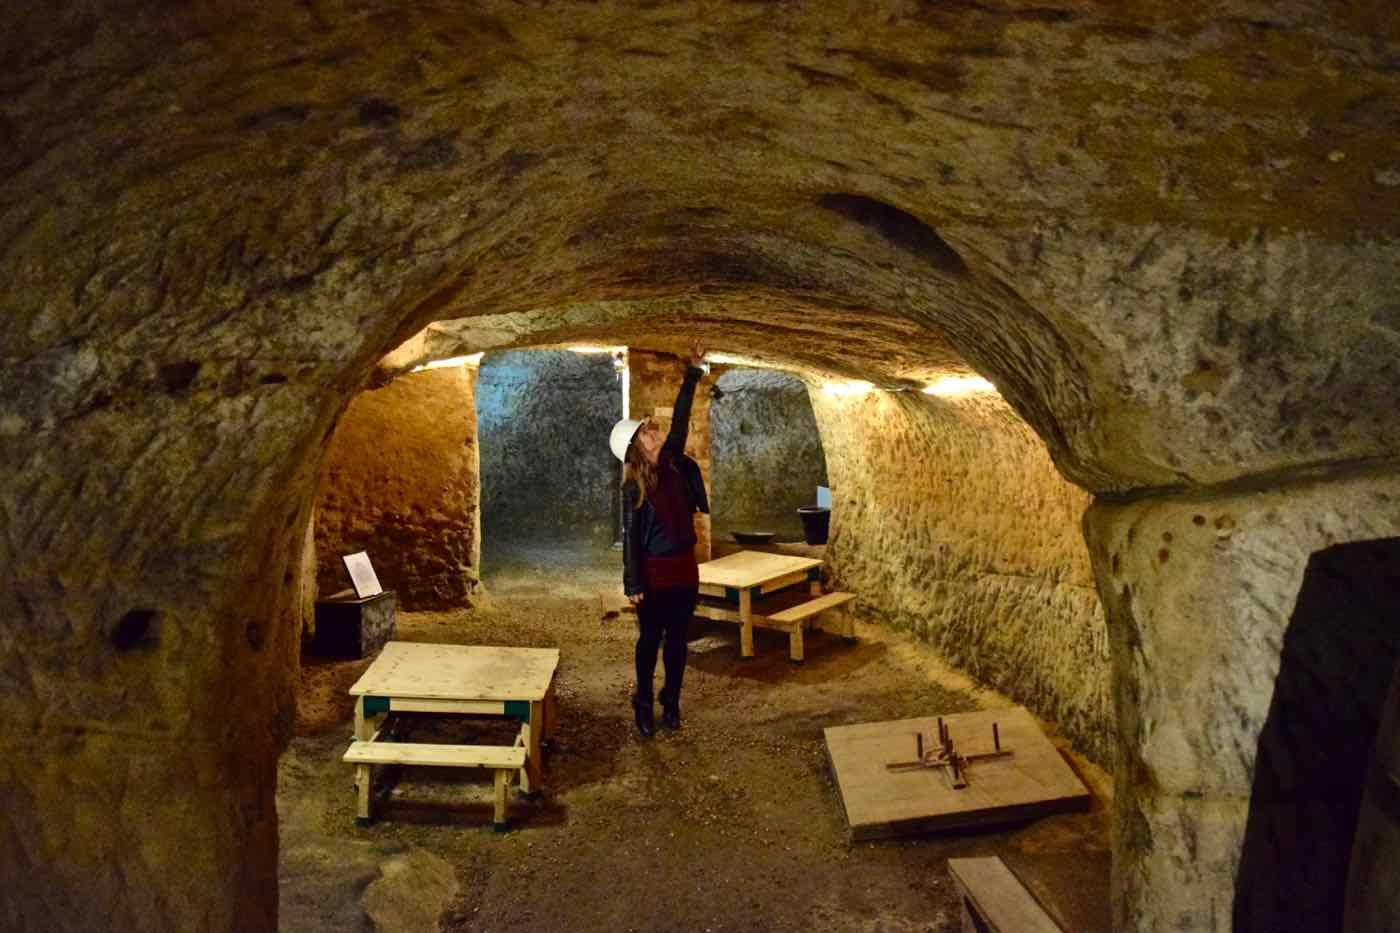 City of Caves, Nottingham